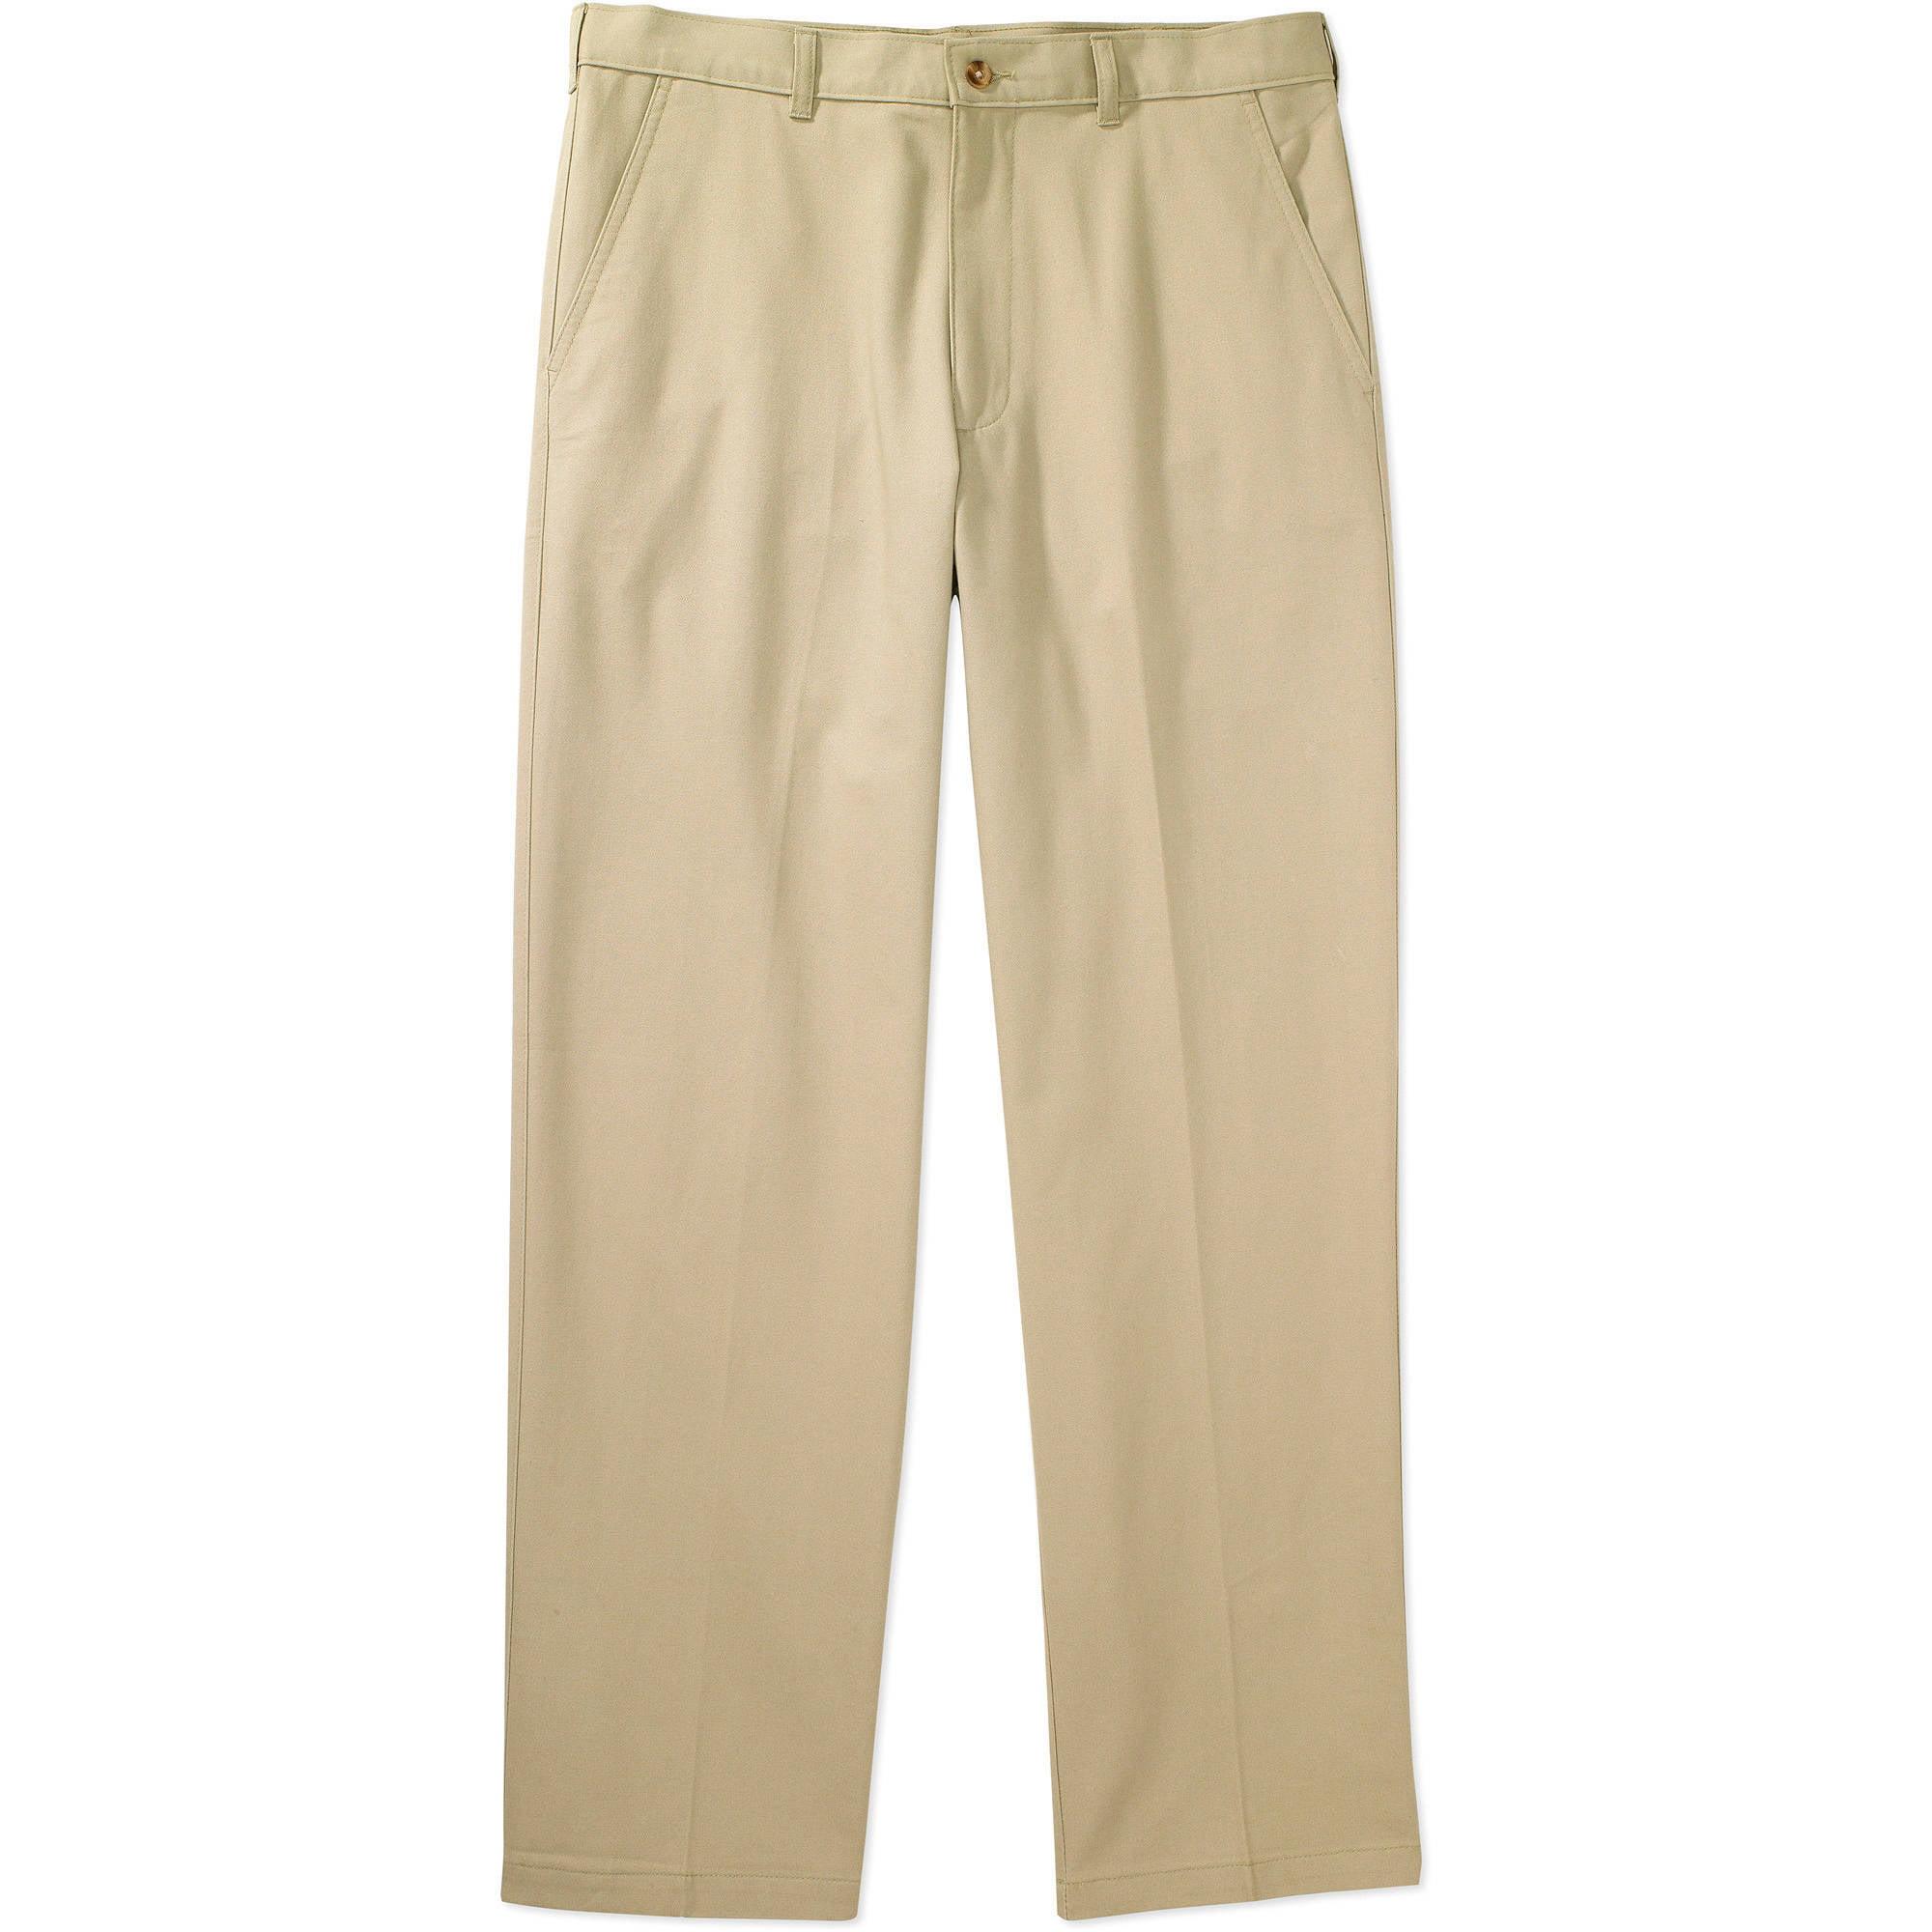 George - Big Men's Flat -Front Wrinkle-Resistant Pants